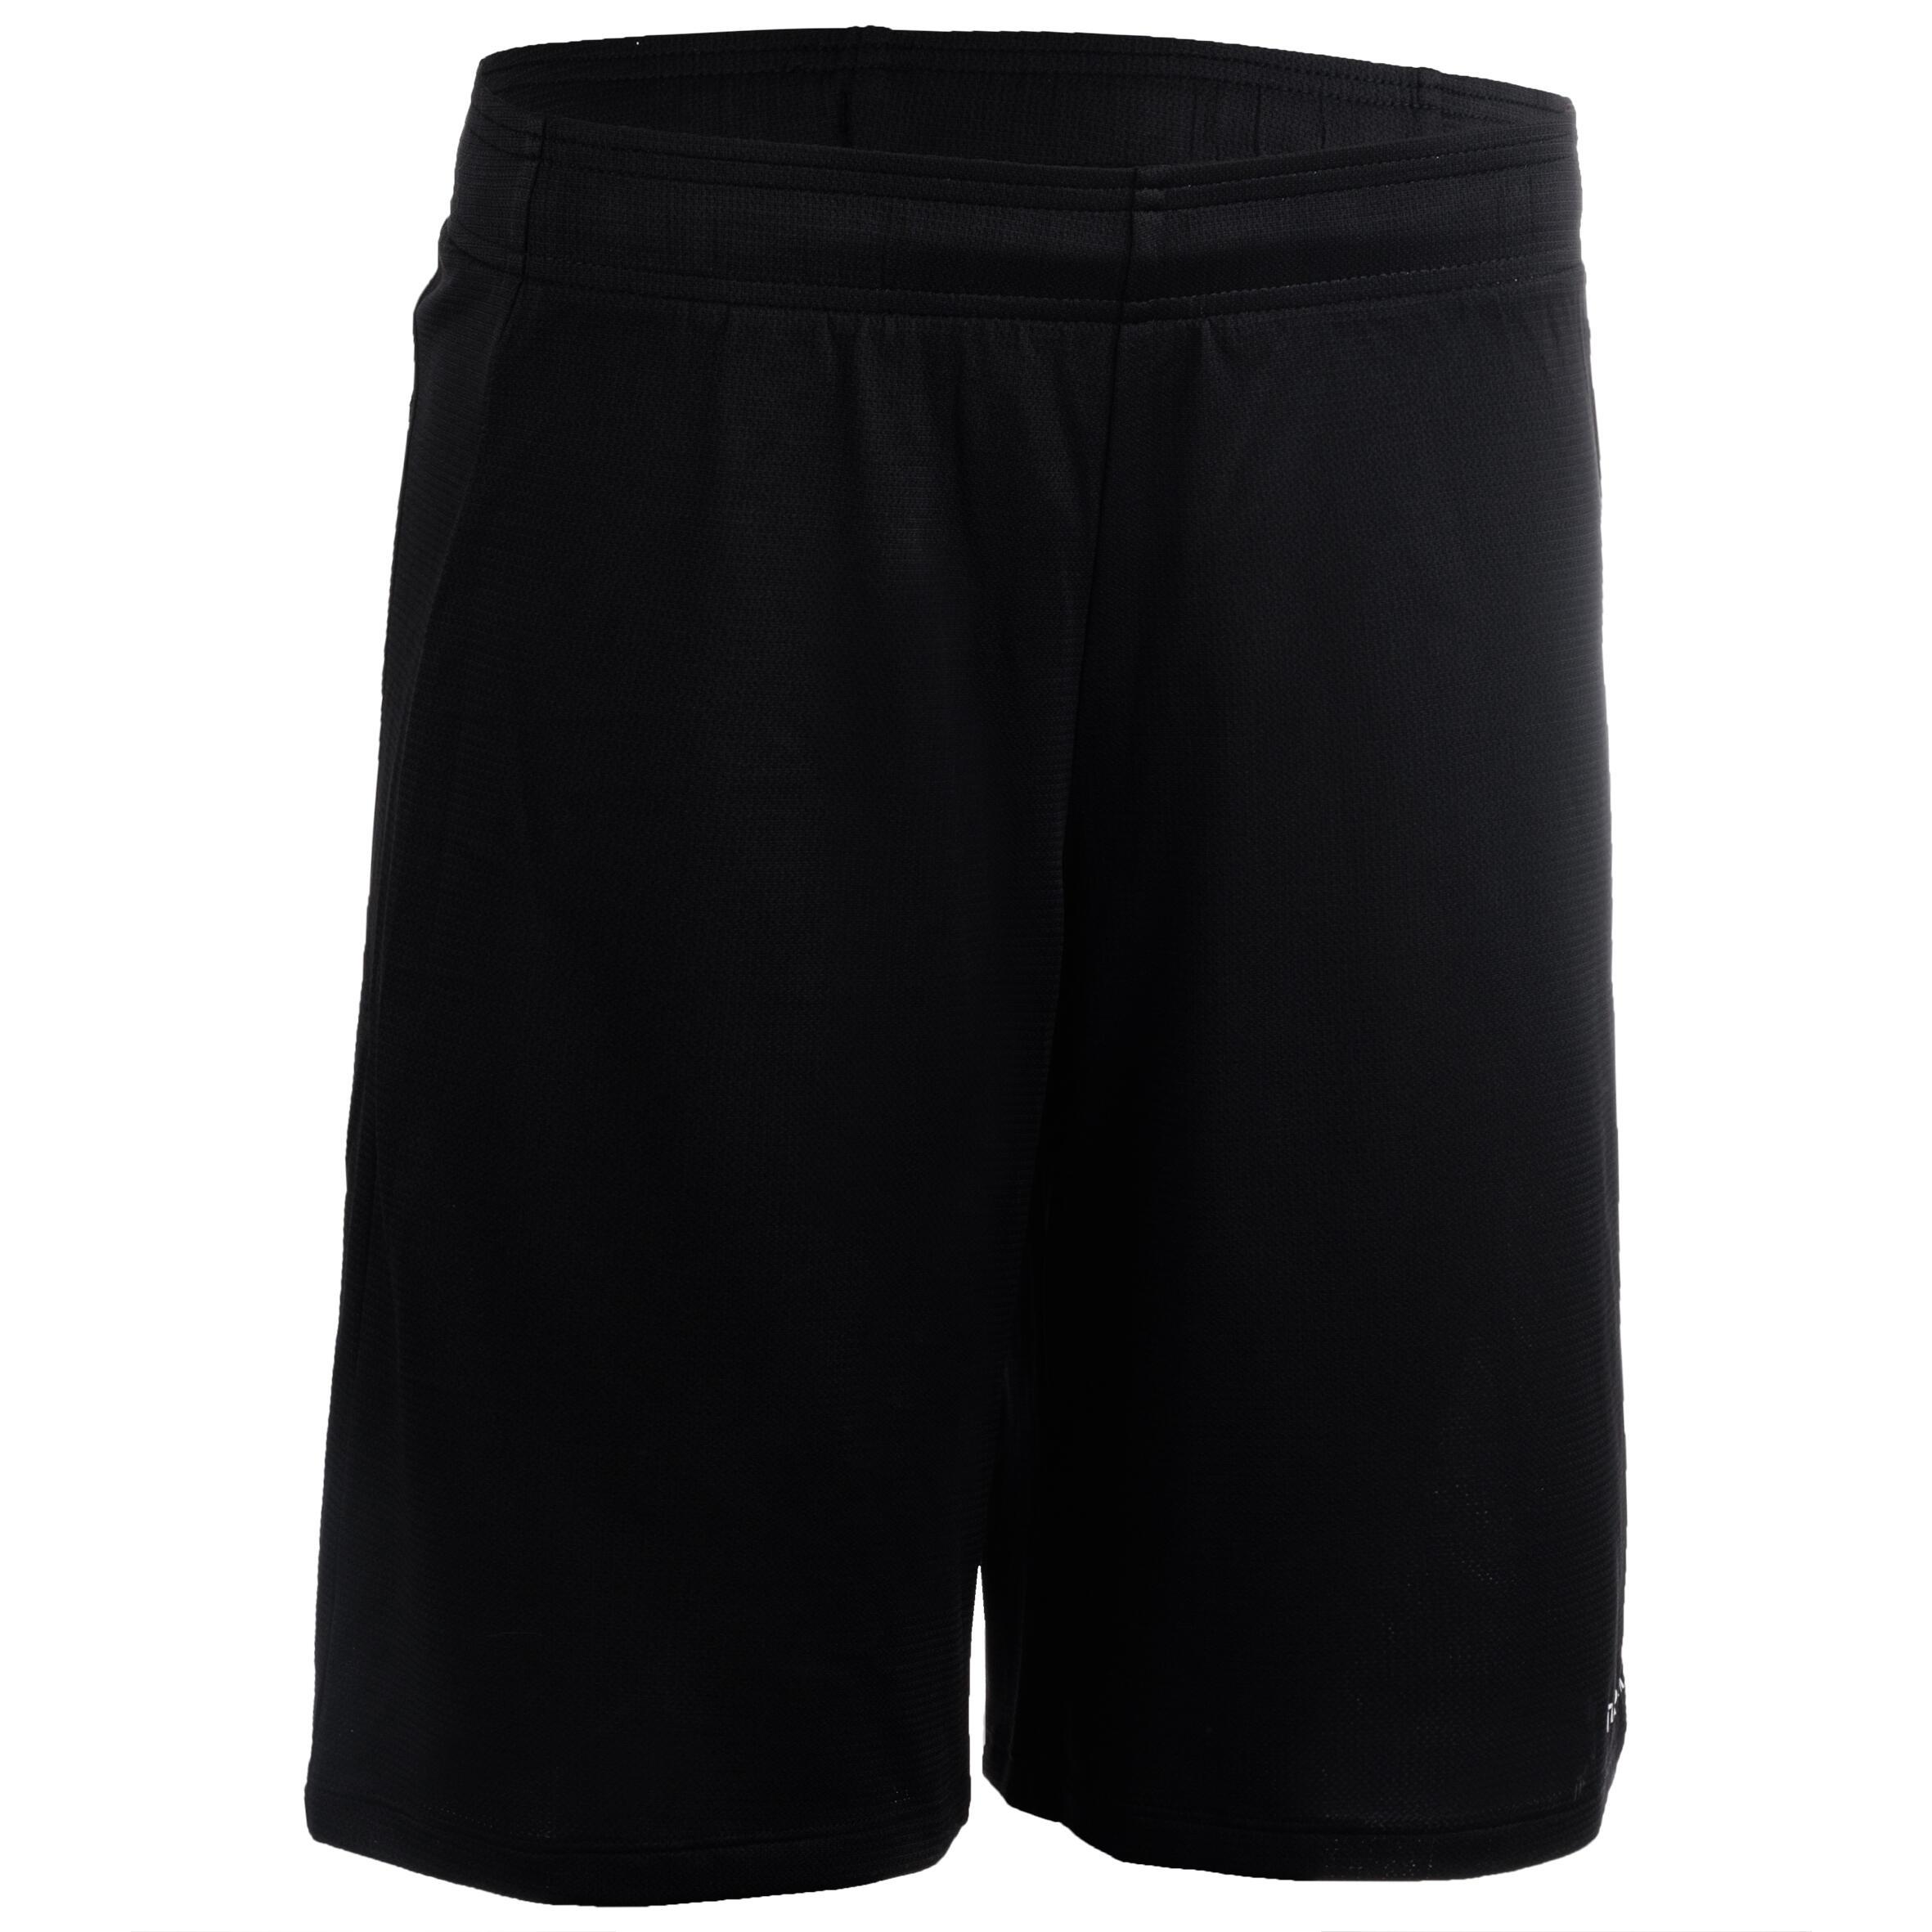 Basketballshorts SH100 Damen schwarz | Sportbekleidung > Sporthosen > Basketballshorts | Schwarz - Weiß | Tarmak